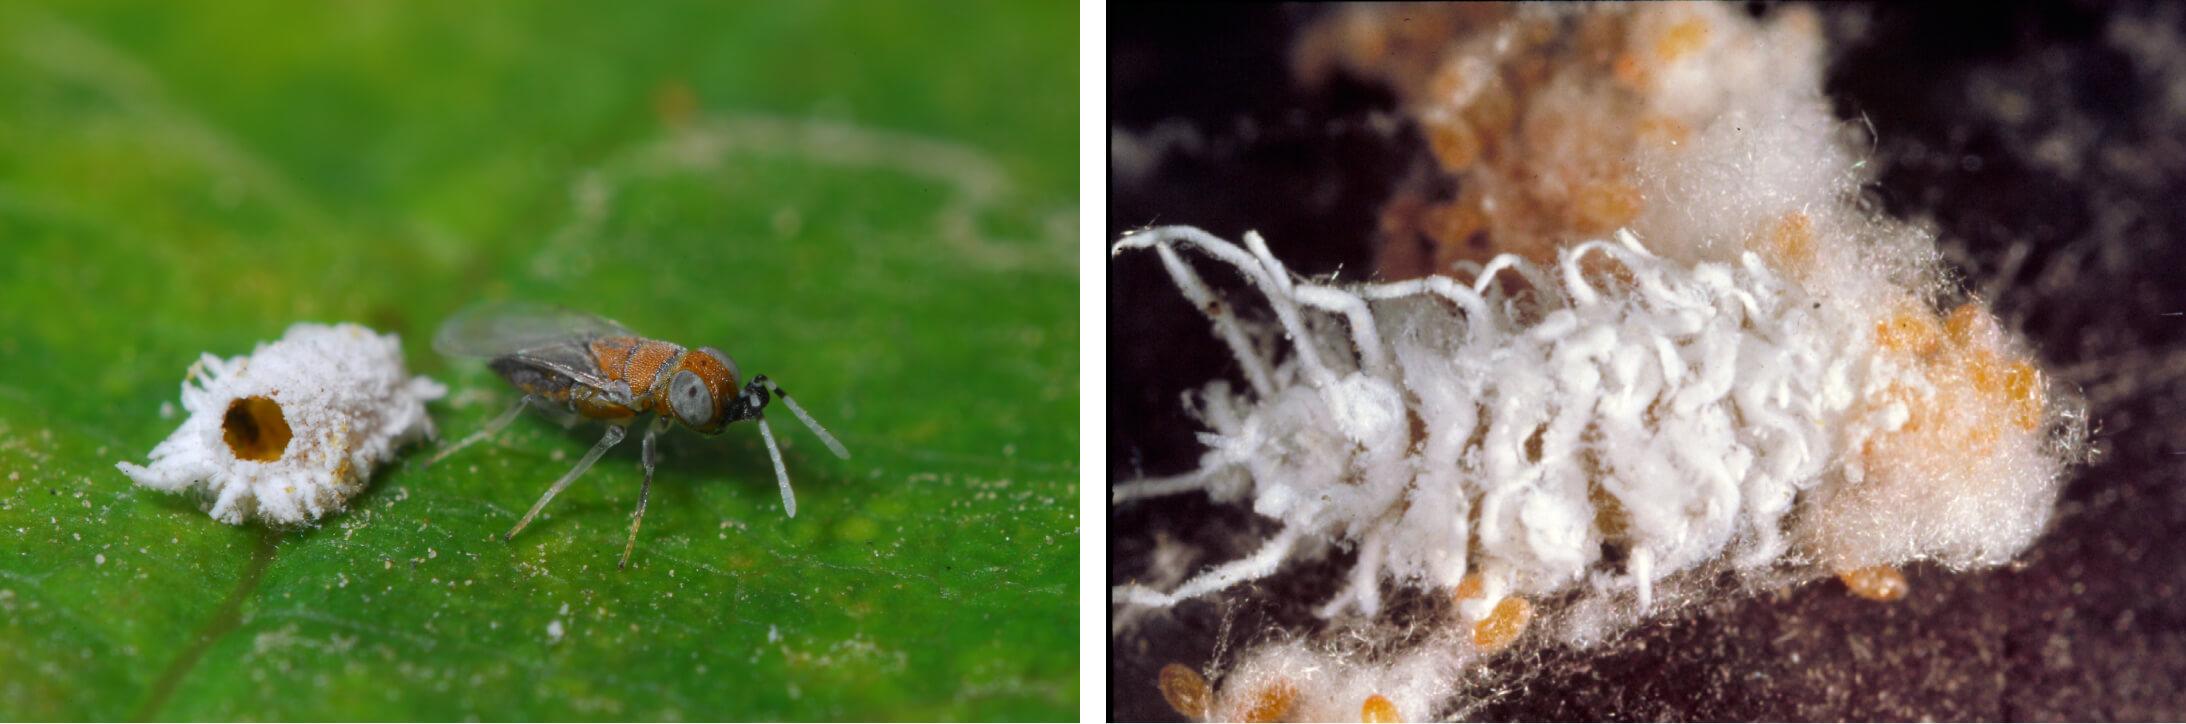 Mark Hoddle in Pakistan collecting Tamarixia radiata, a natural enemy of Asian citrus psyllid, Diaphorina citri.